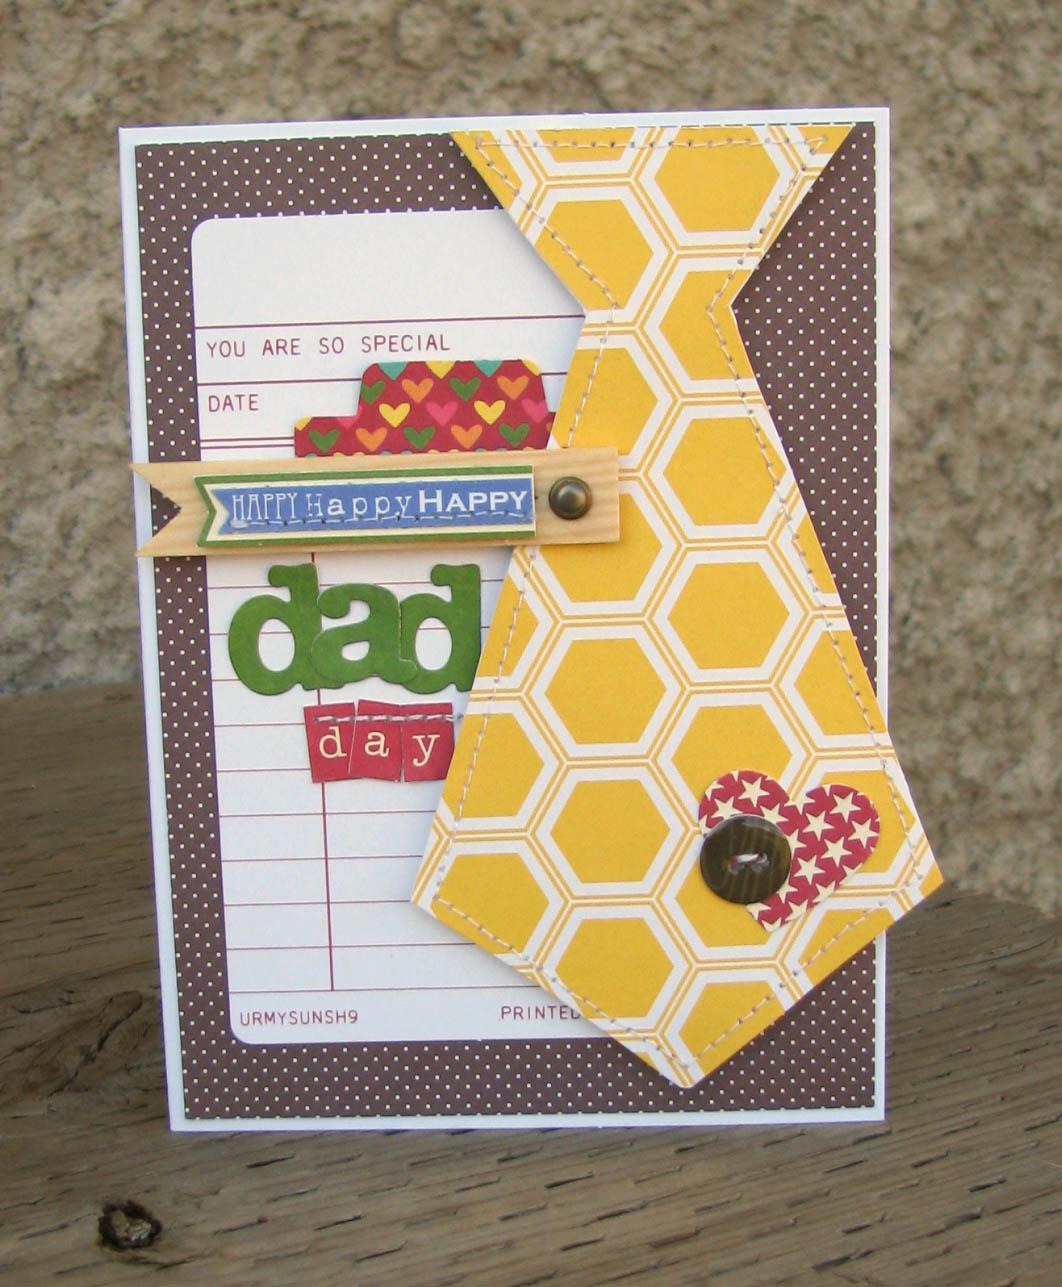 Delightful Card Making Ideas Scrapbooking Part - 12: Nicole Nowosad